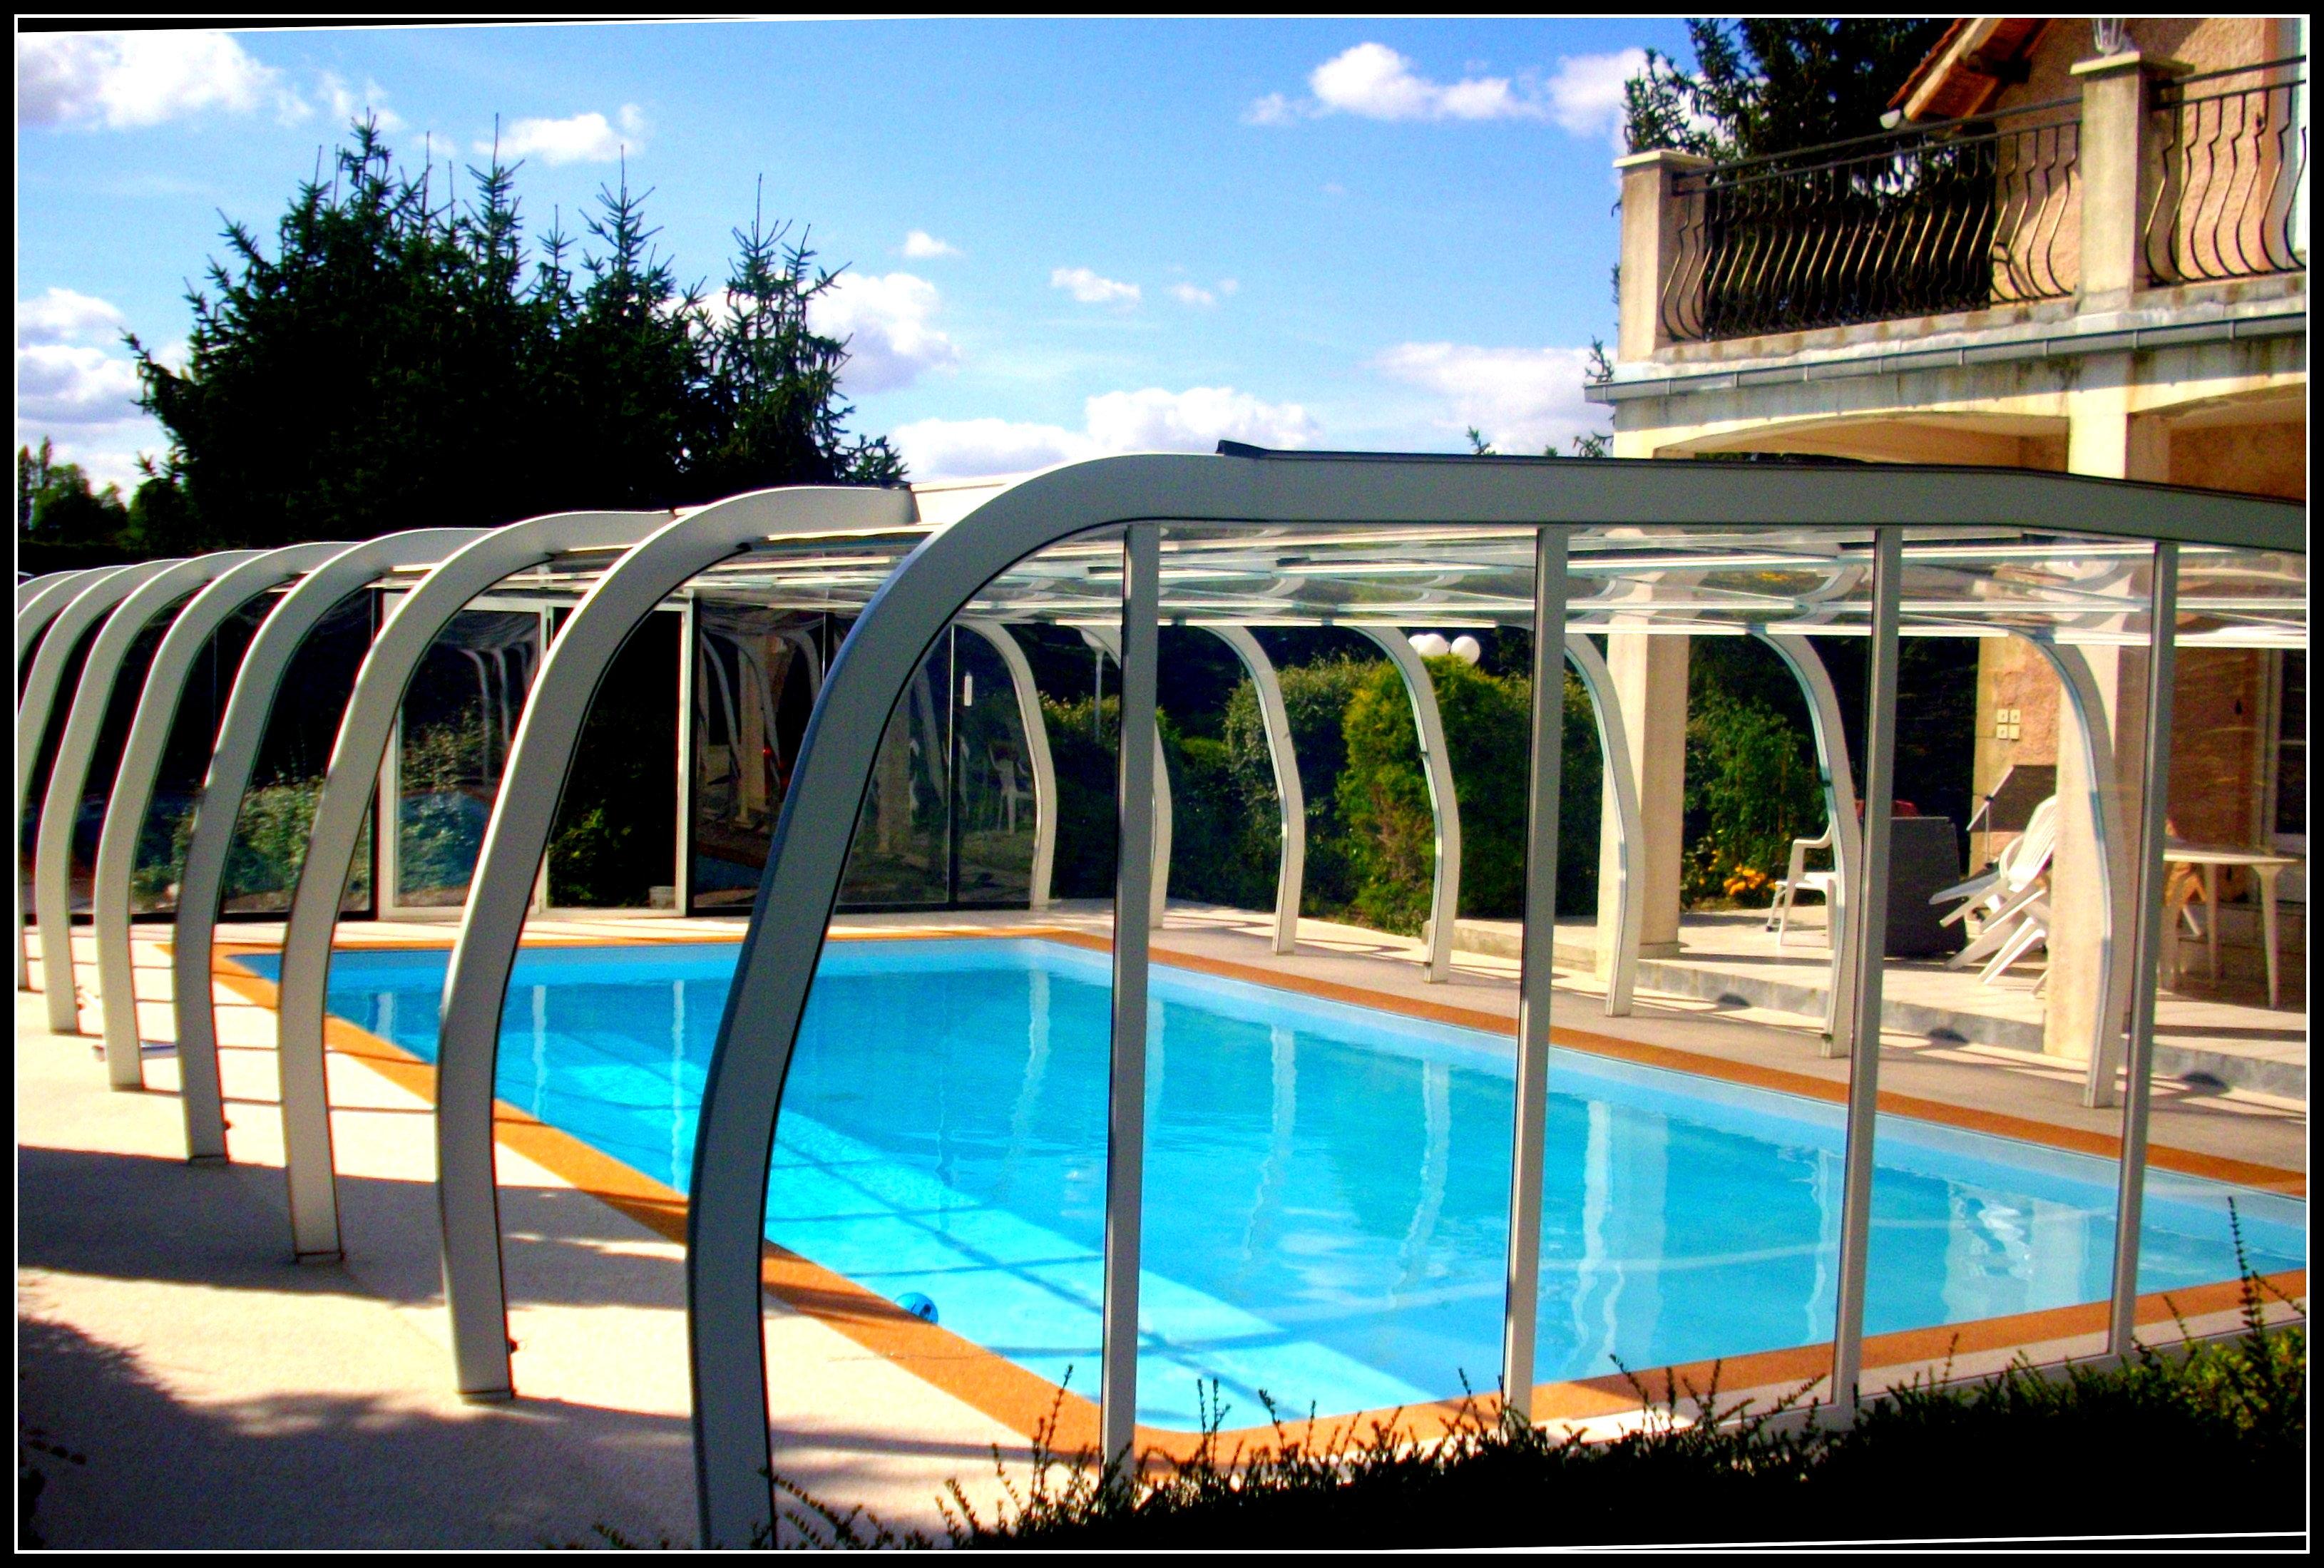 Contour de piscine antid rapant for Piscine 3 05 x 1 22